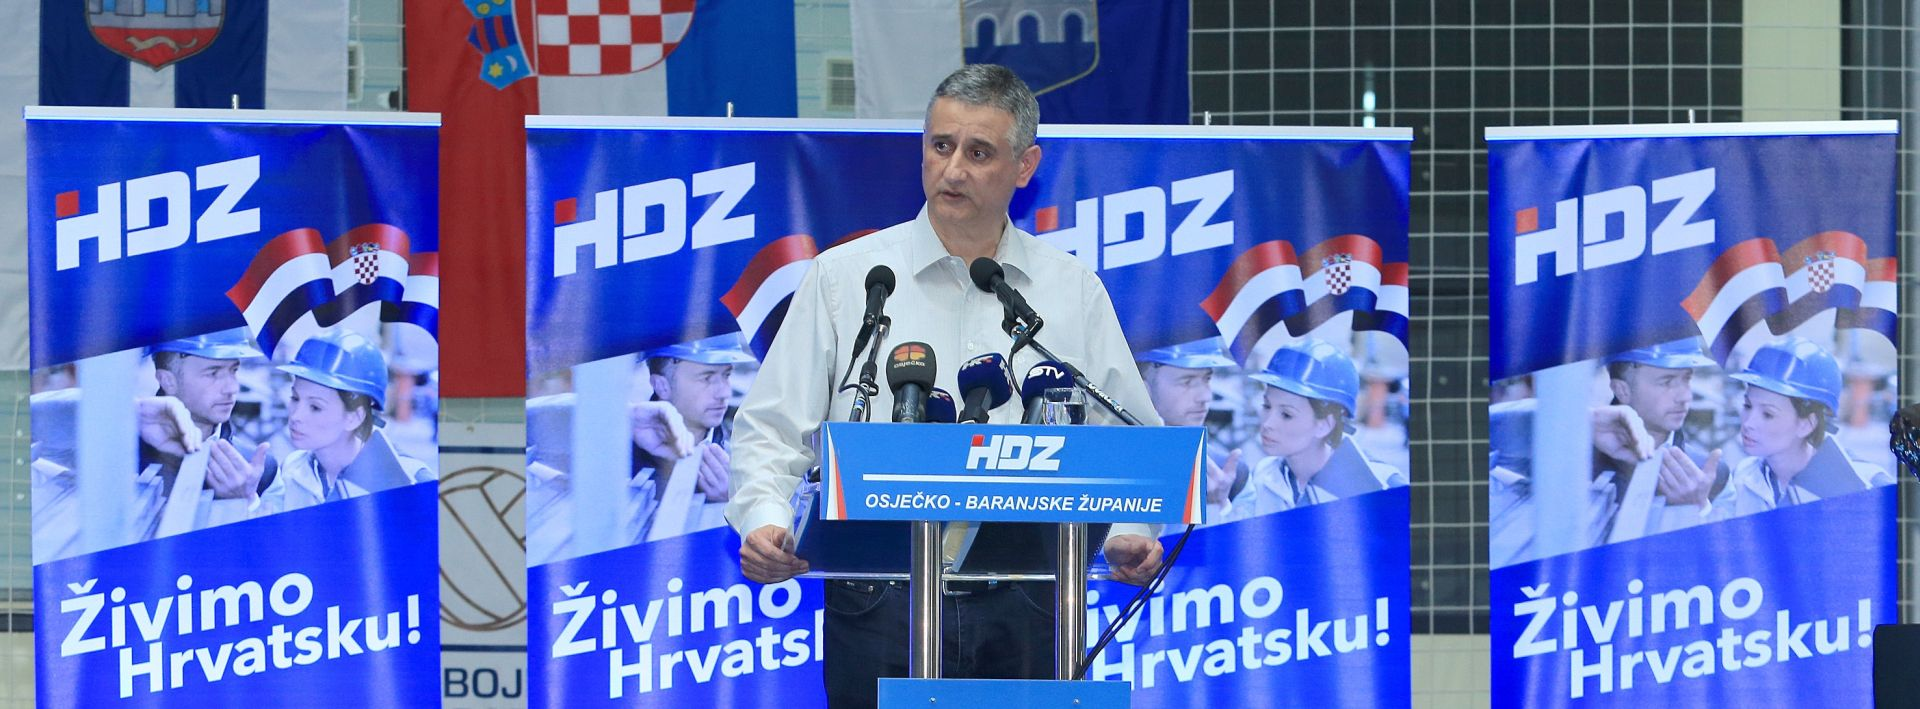 HDZ predstavlja svoj gospodarski program